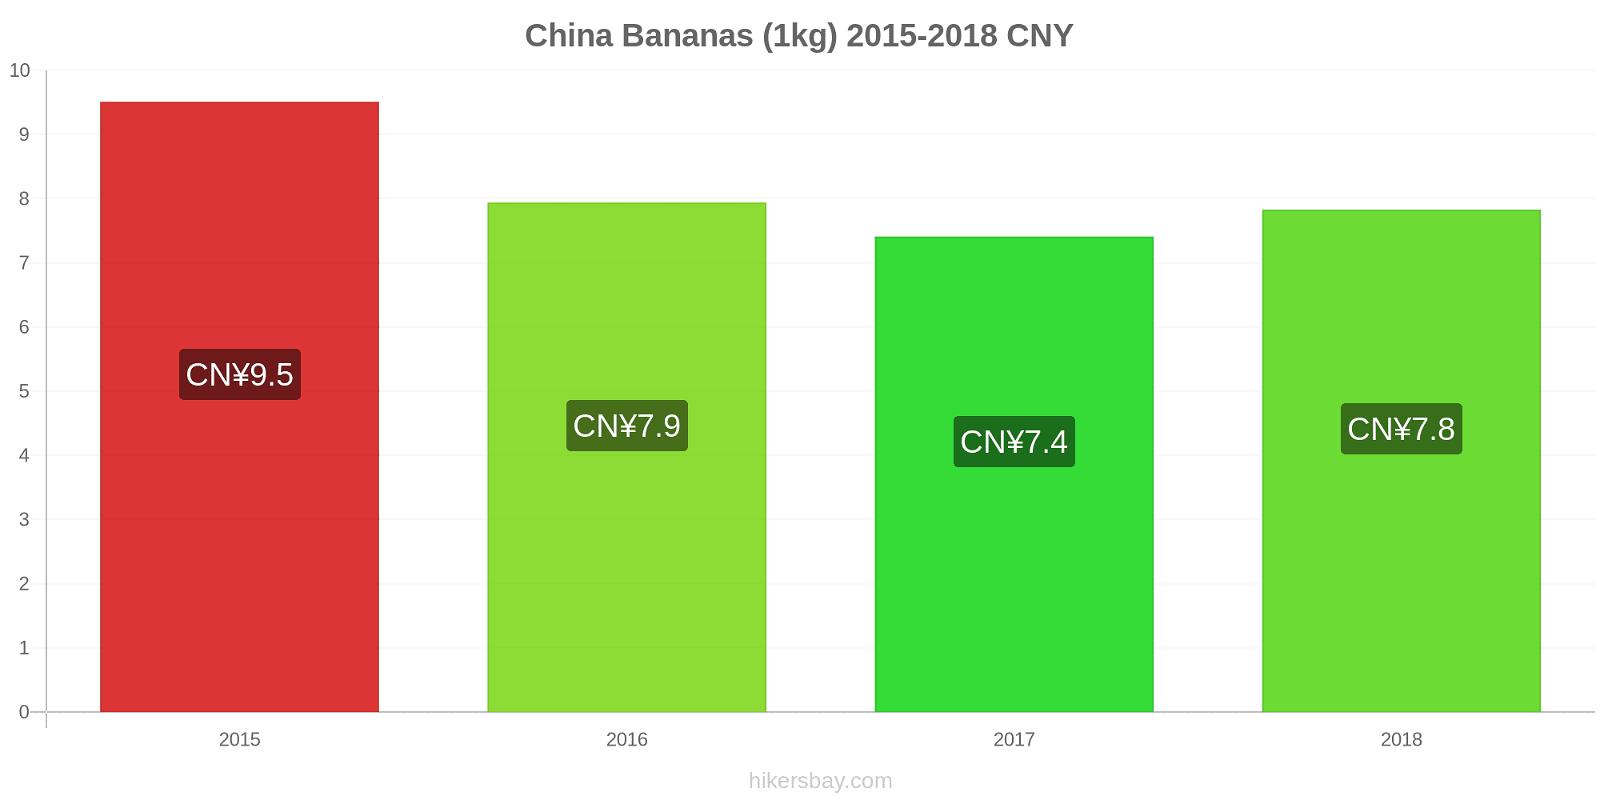 China price changes Bananas (1kg) hikersbay.com